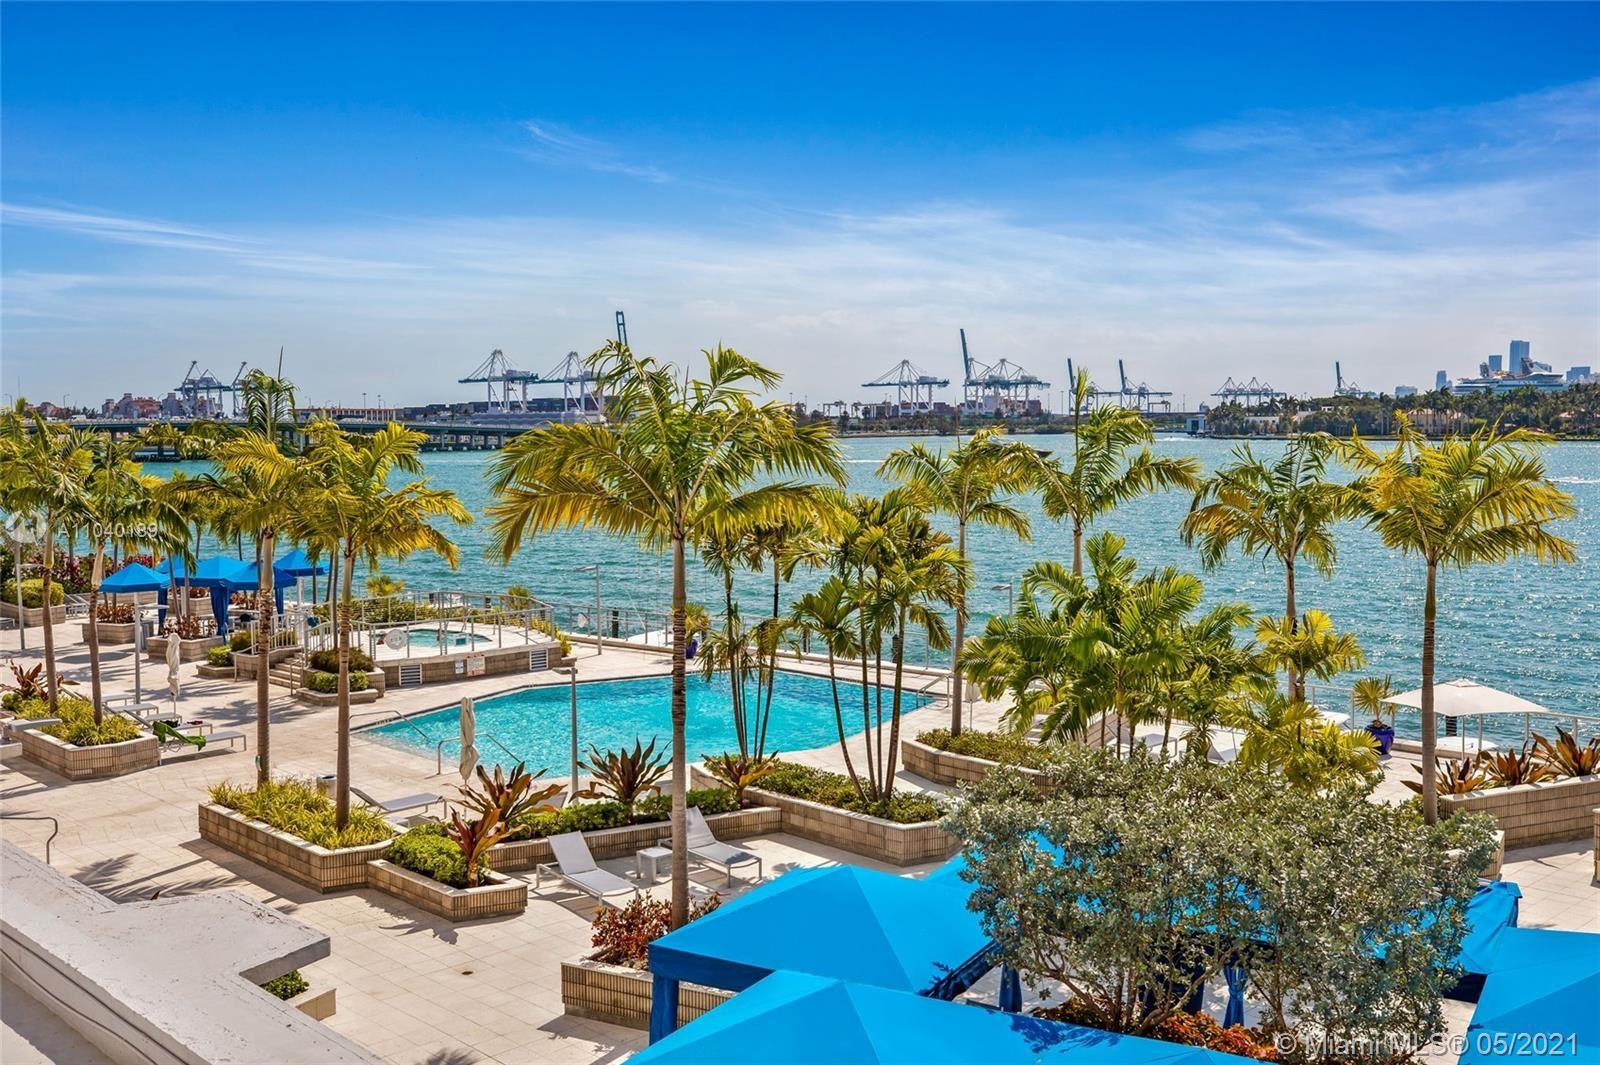 800 West Ave #431, Miami Beach, FL 33139 - #: A11040189